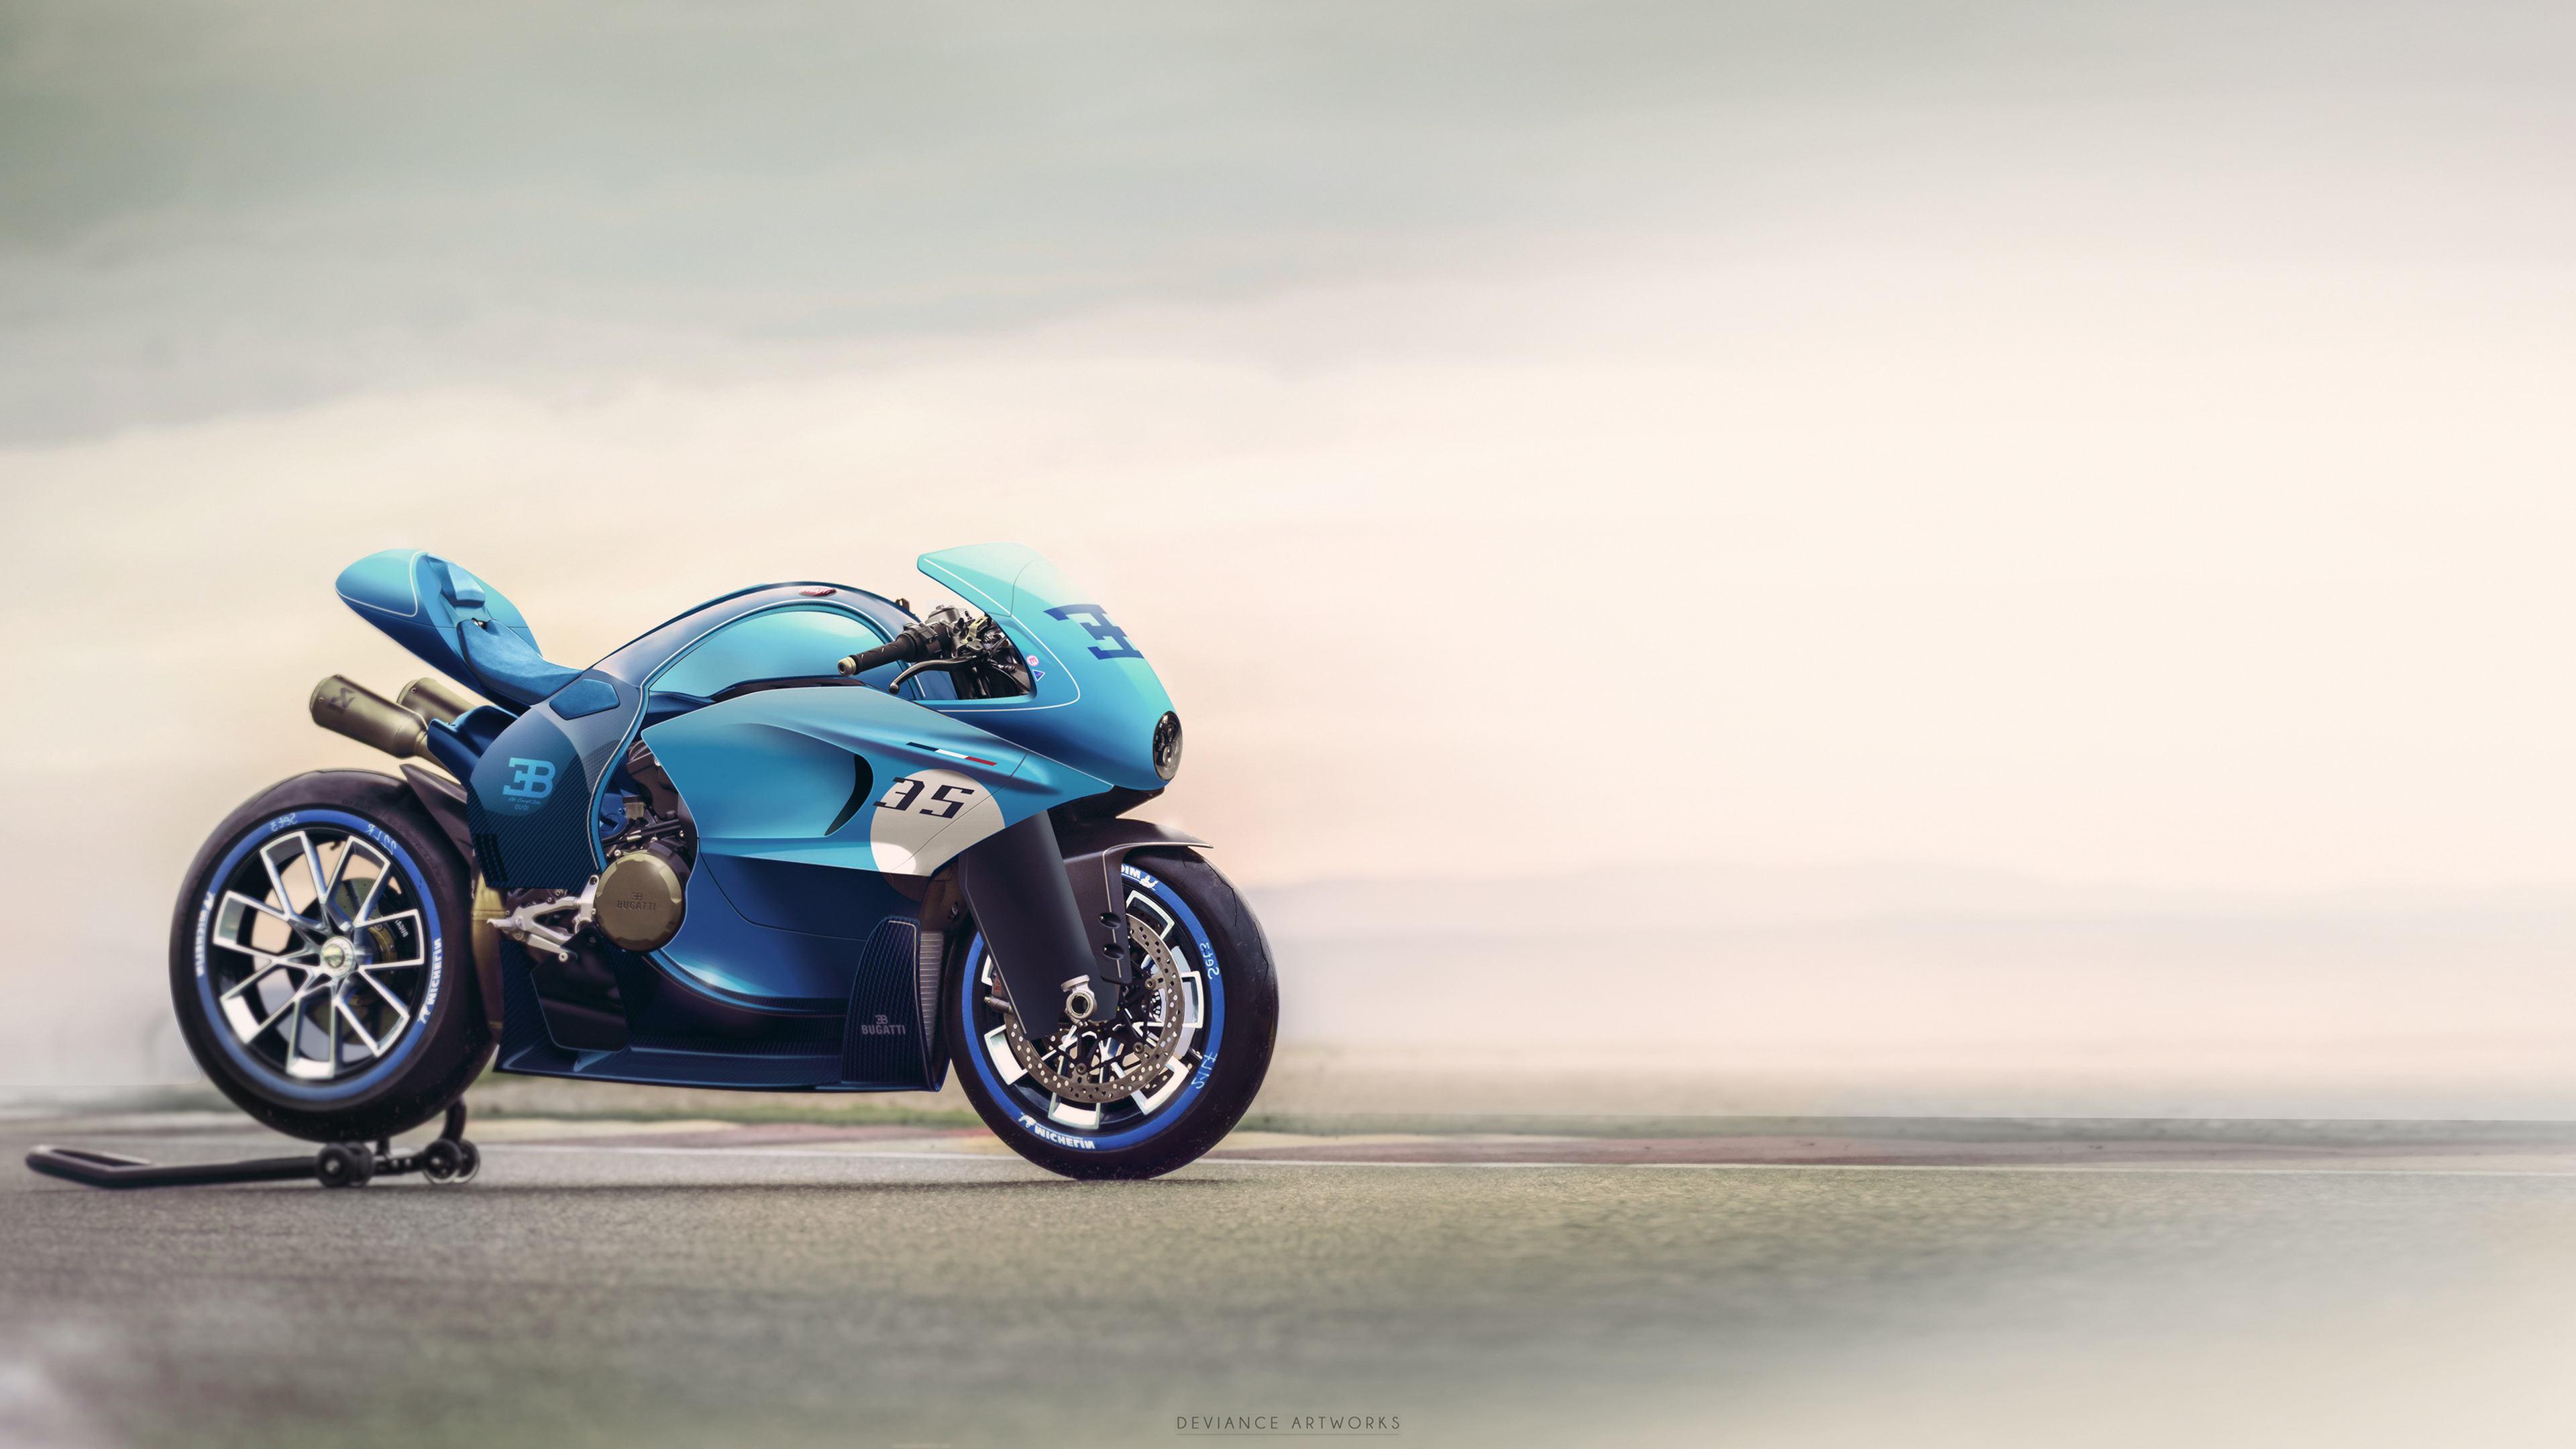 bugatti concept bike 4k 1541295677 - Bugatti Concept Bike 4k - hd-wallpapers, bugatti wallpapers, bikes wallpapers, behance wallpapers, artist wallpapers, 4k-wallpapers